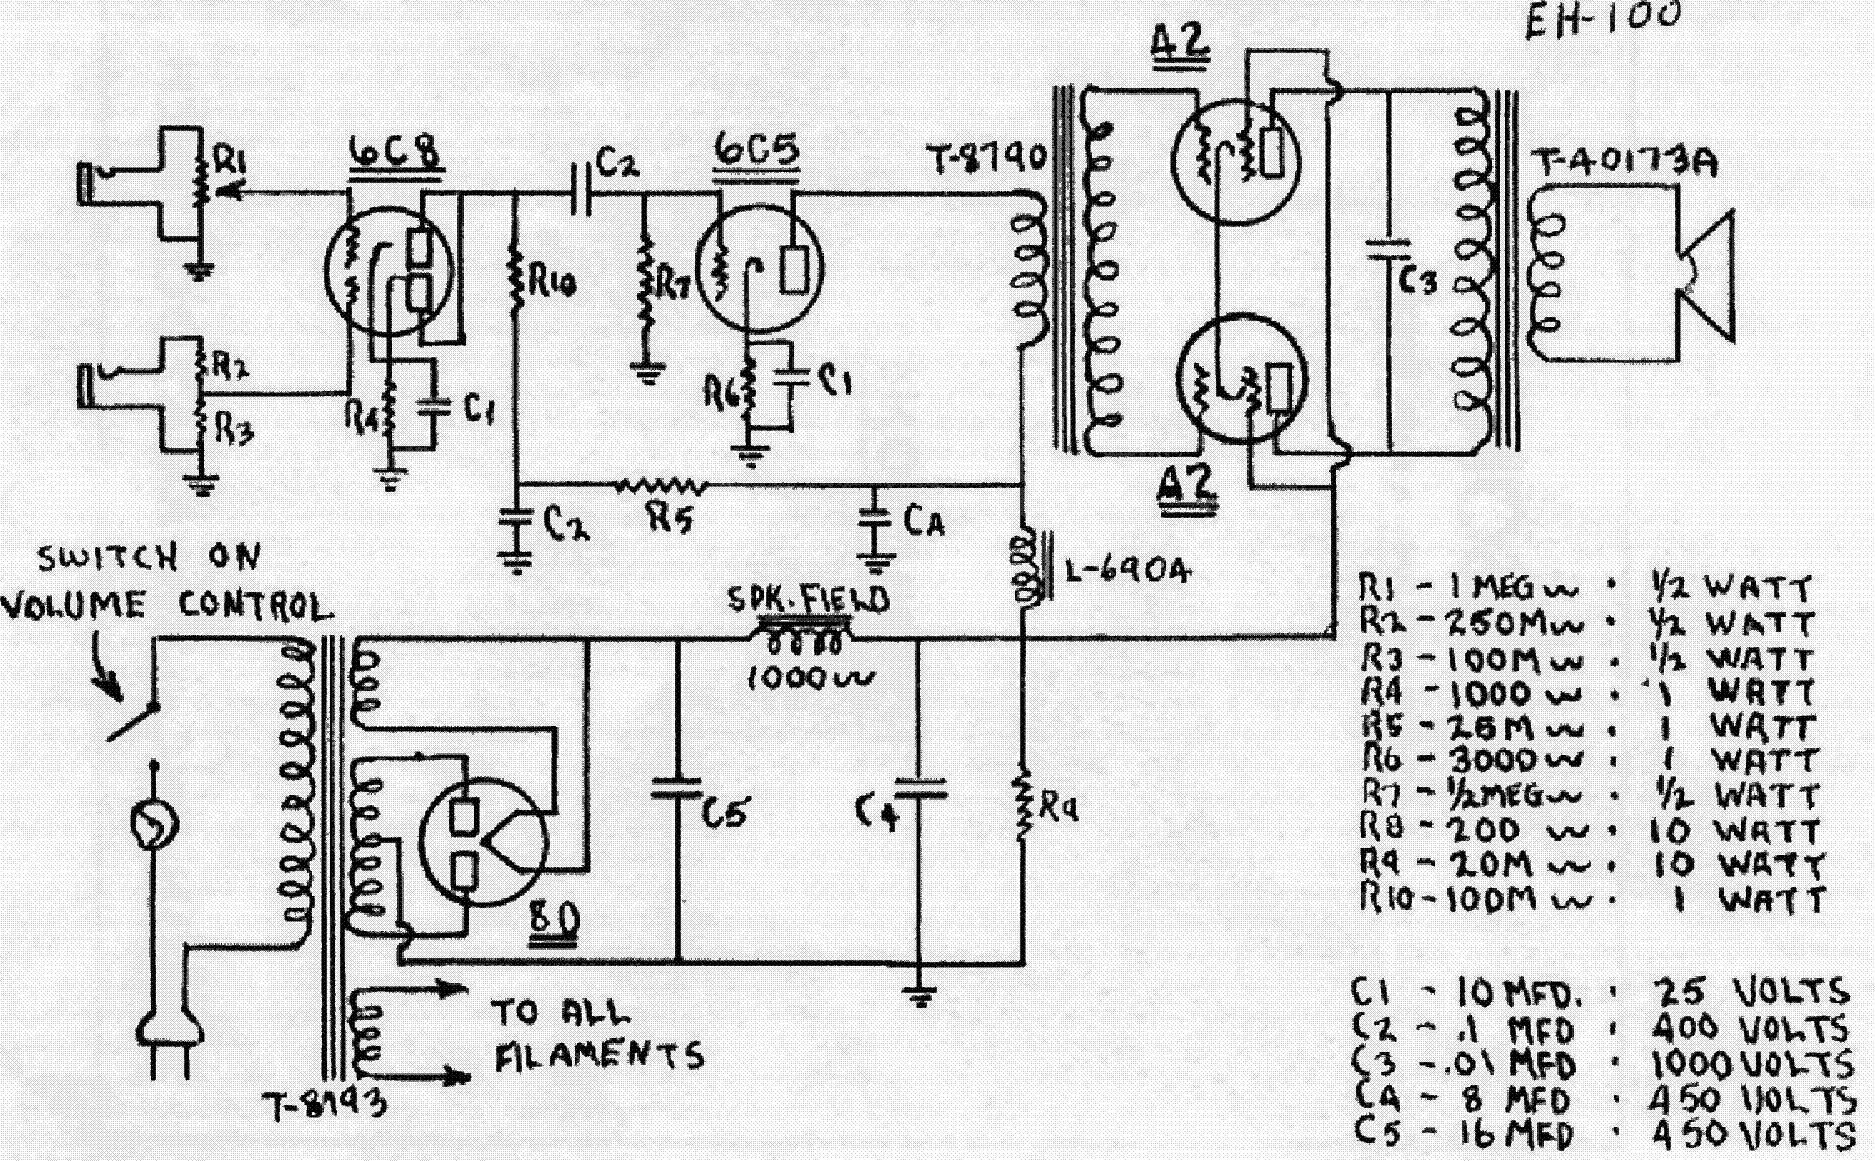 GIBSON GA-80 VARITONE SCHEMATIC Service Manual download, schematics ...